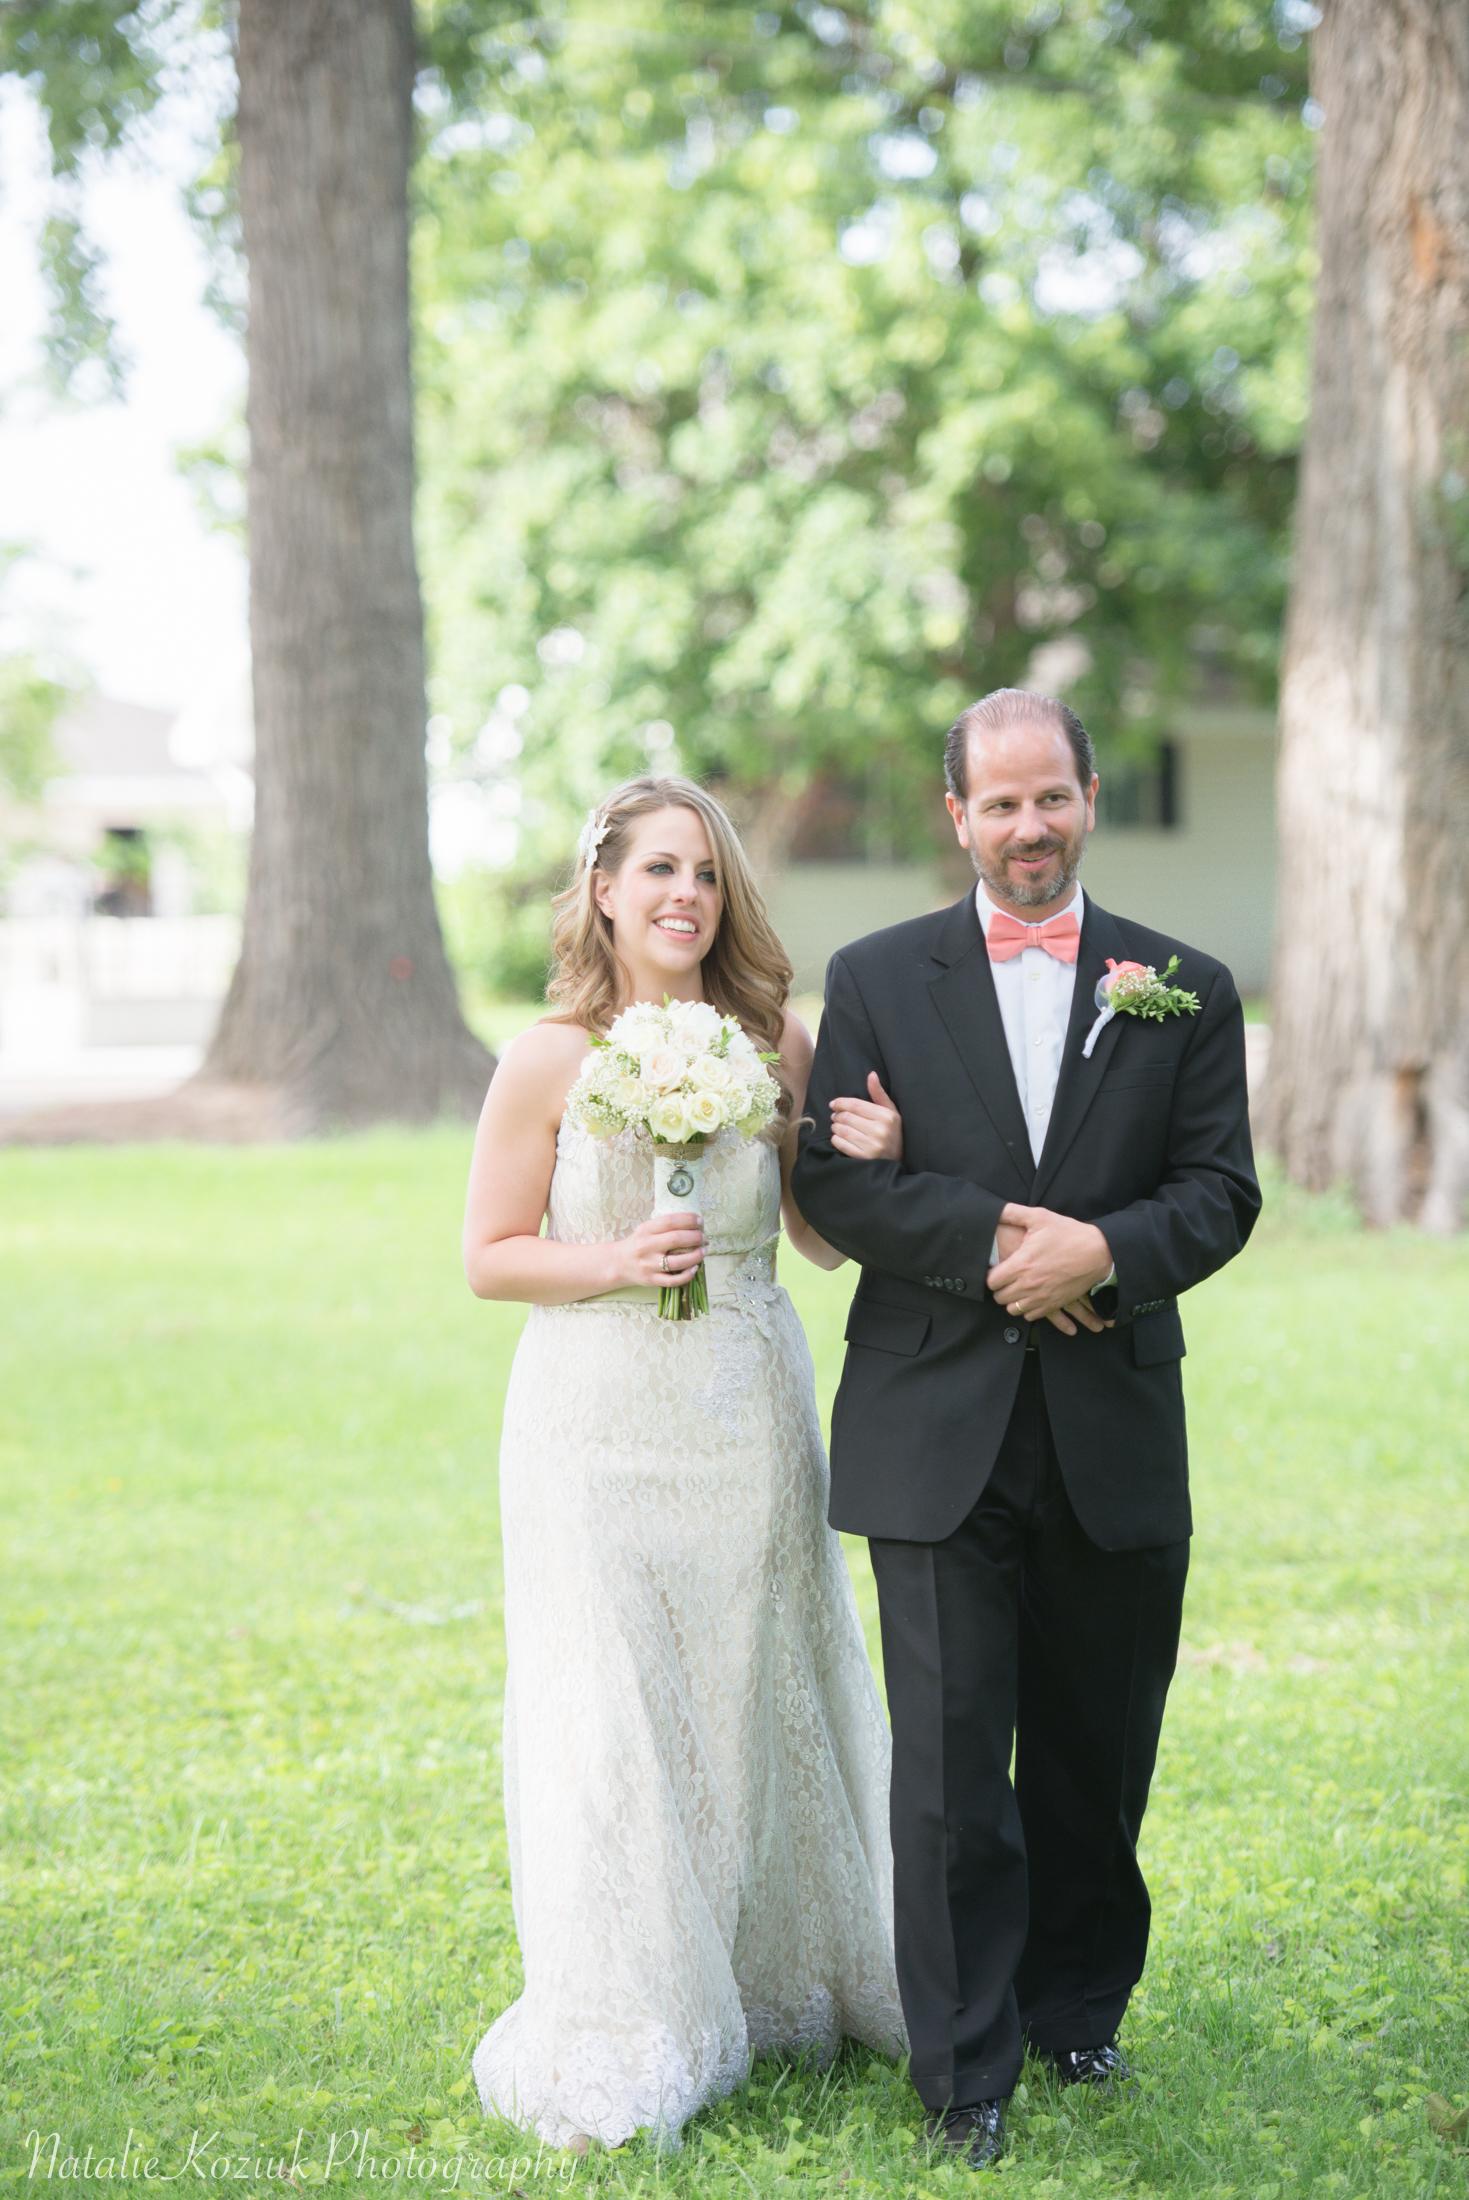 Natalie Koziuk Photography | Boise wedding photographer | ceremony | Star, ID | Bride Groom | nkoziukphotography.com